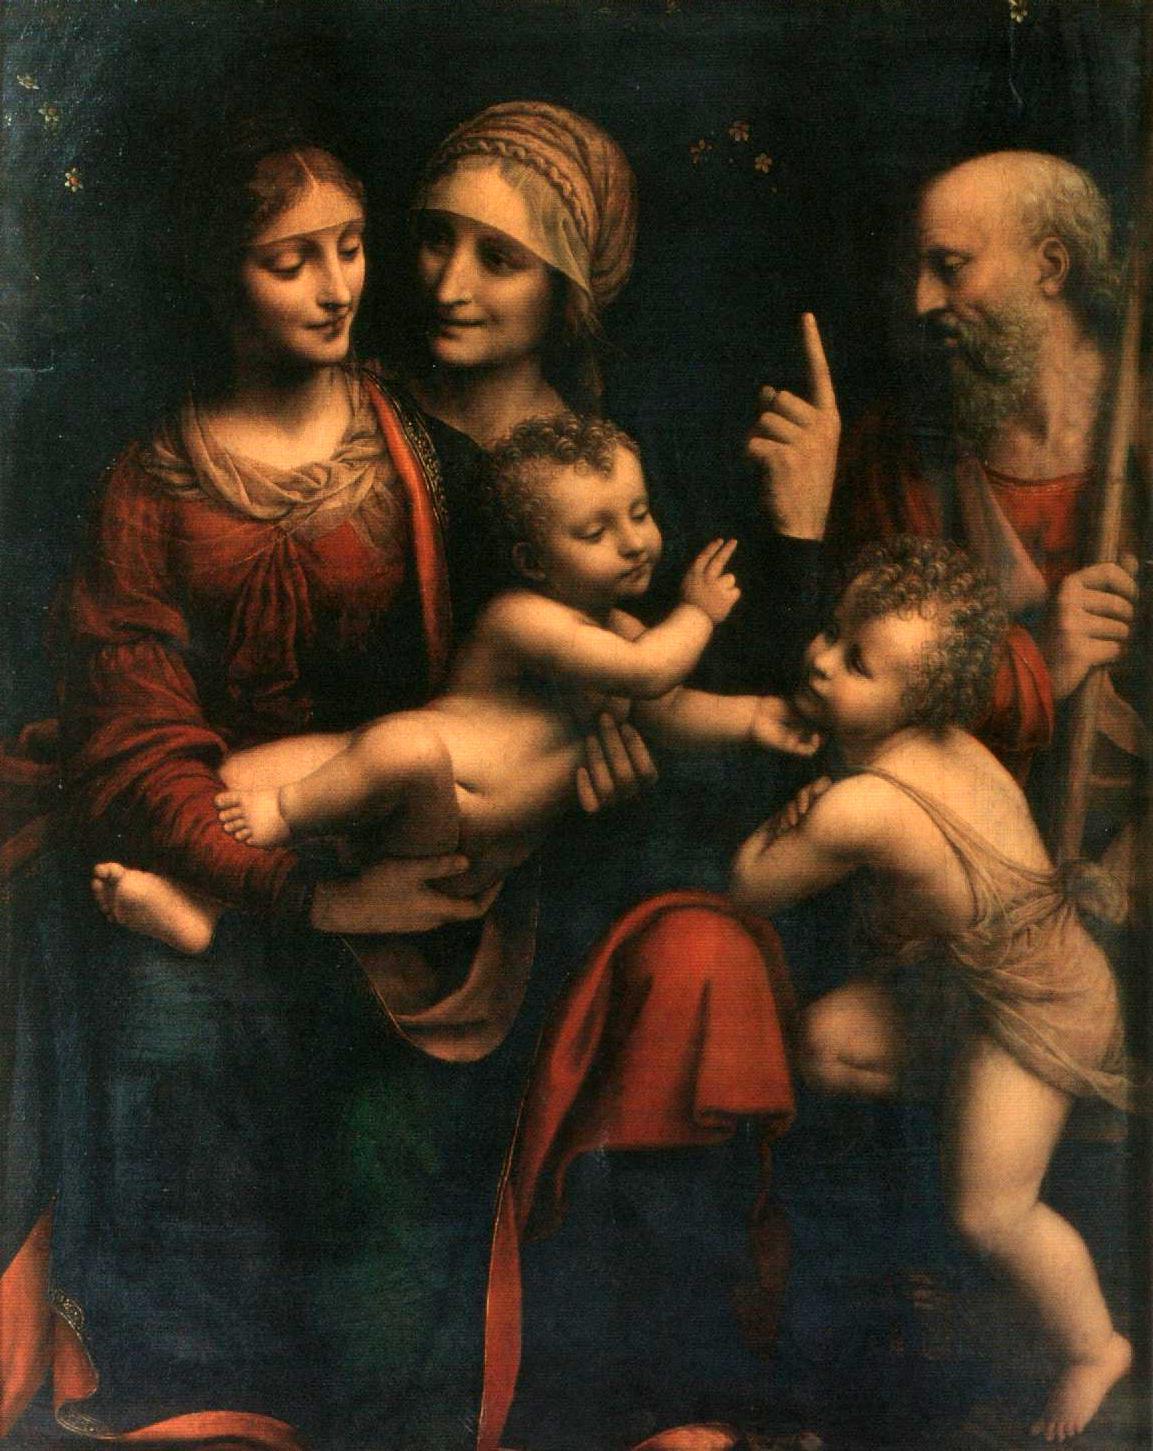 Sacra_Famiglia_2020